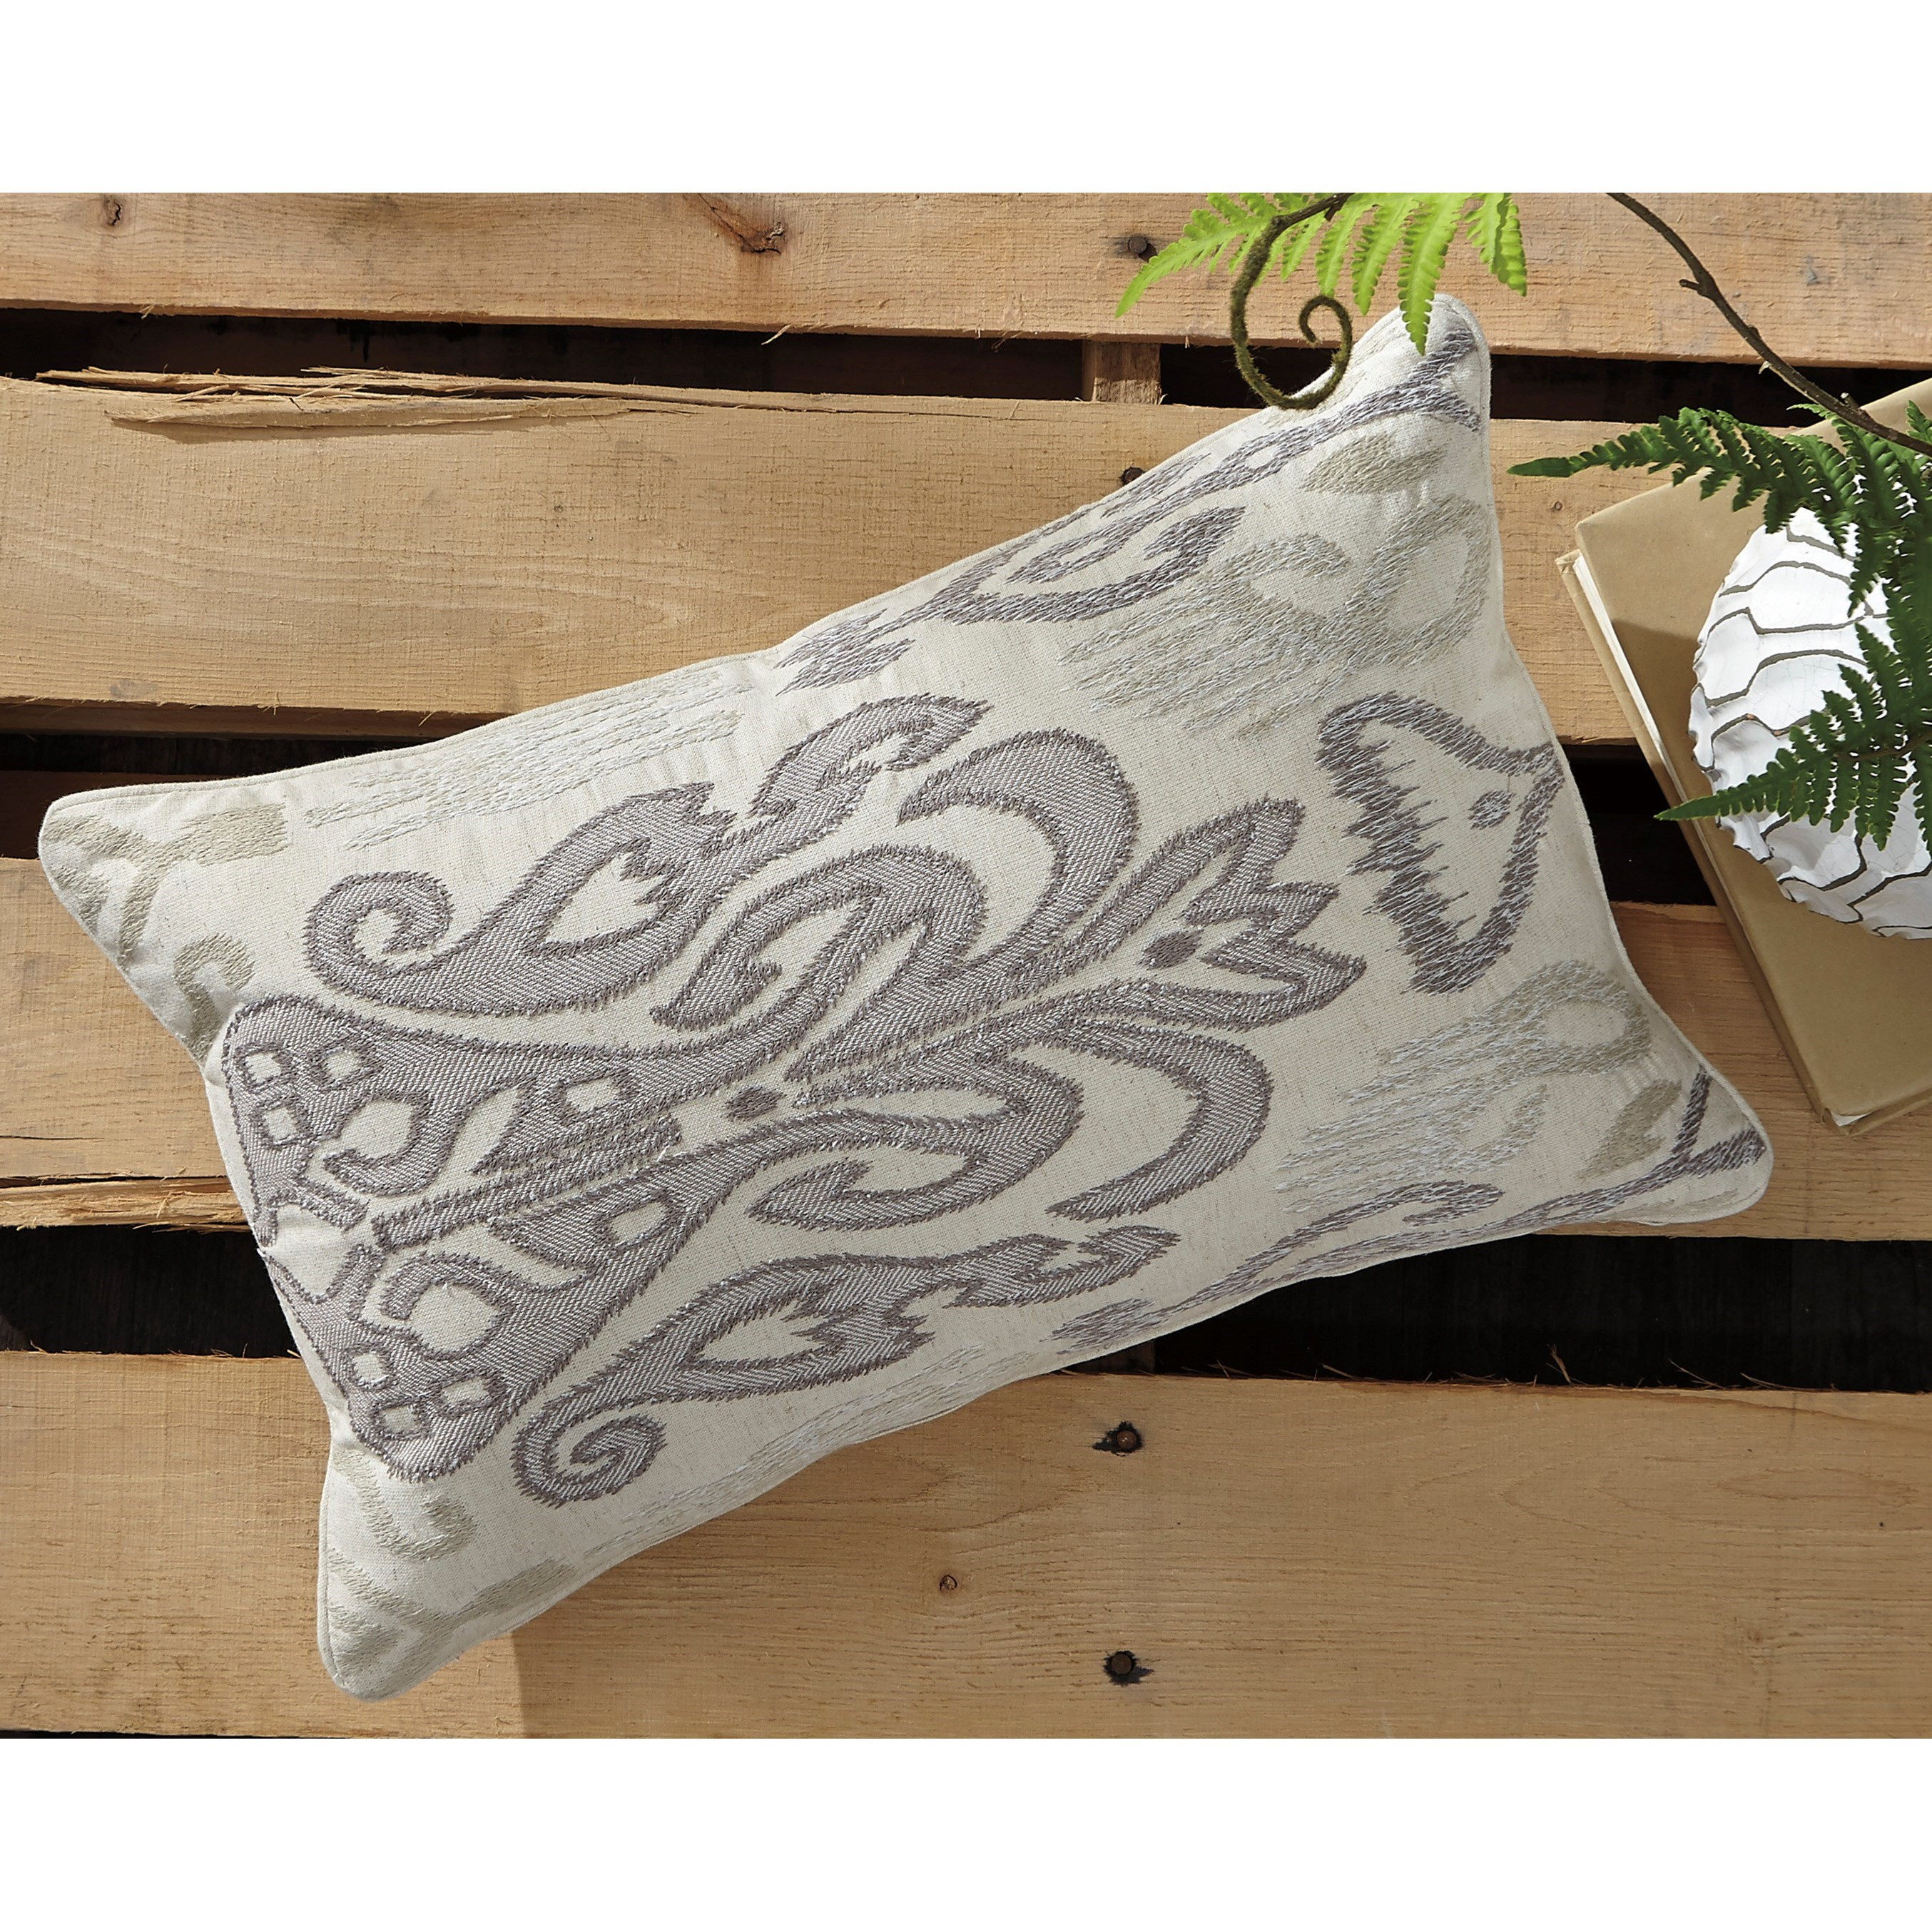 Signature Design by Ashley Pillows Orono Natural Pillow - Olindeu0026#39;s Furniture - Throw Pillows